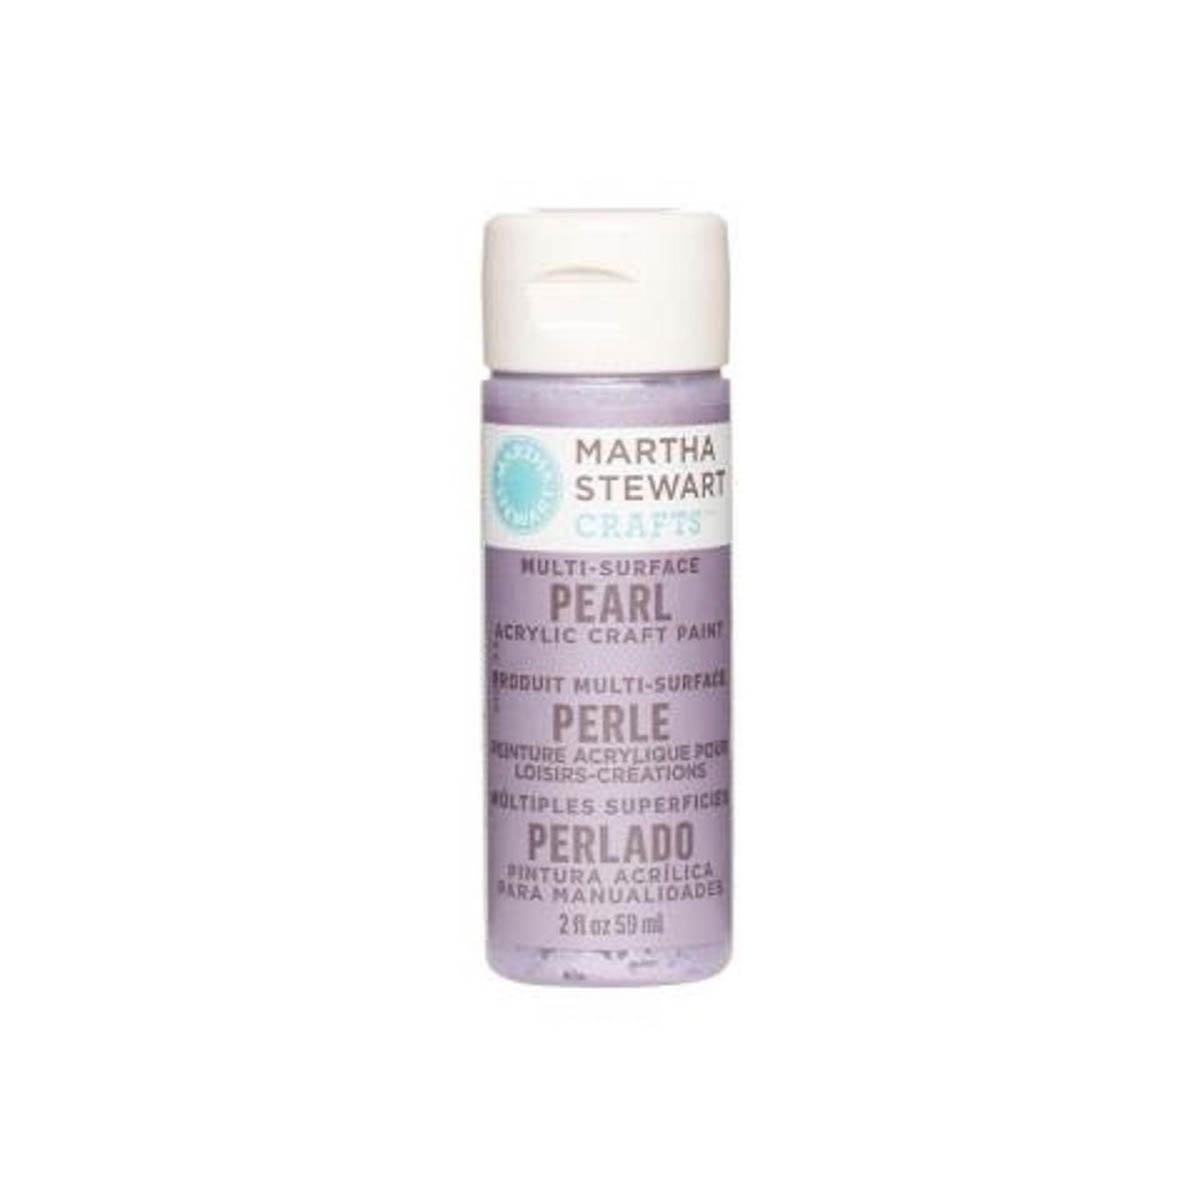 Martha Stewart® 2oz Multi-Surface Pearl Acrylic Craft Paint - Eclipse